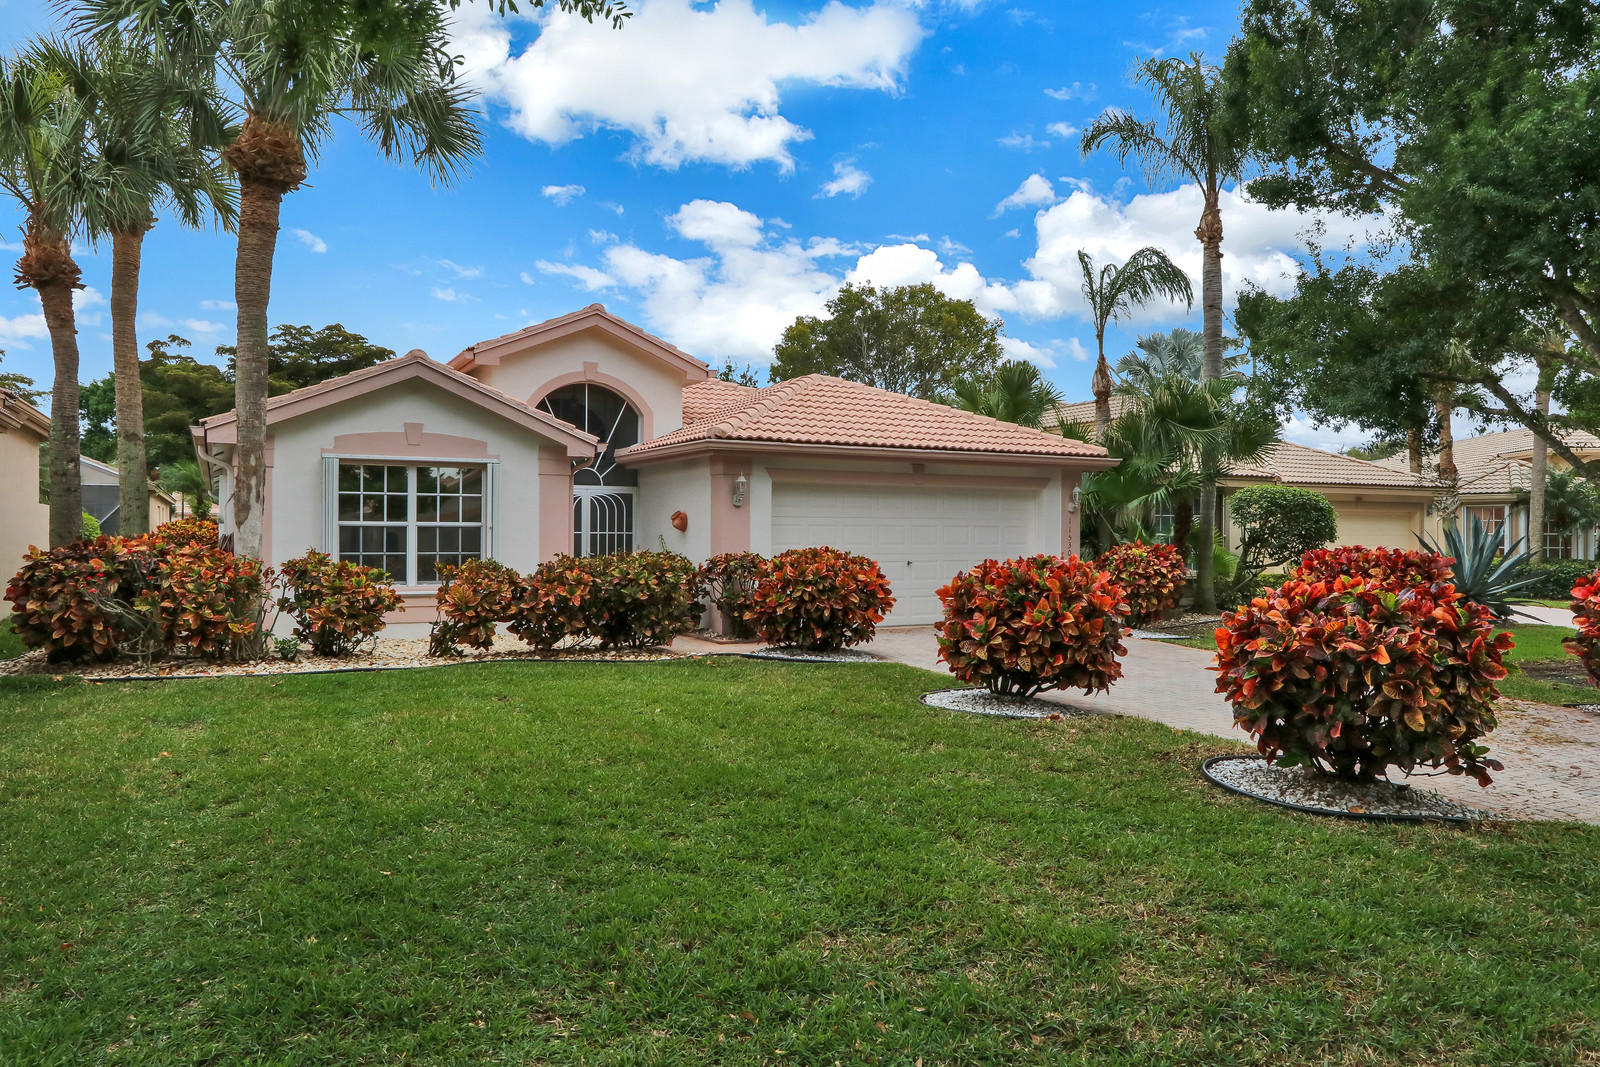 11530 Corazon Court  Boynton Beach FL 33437